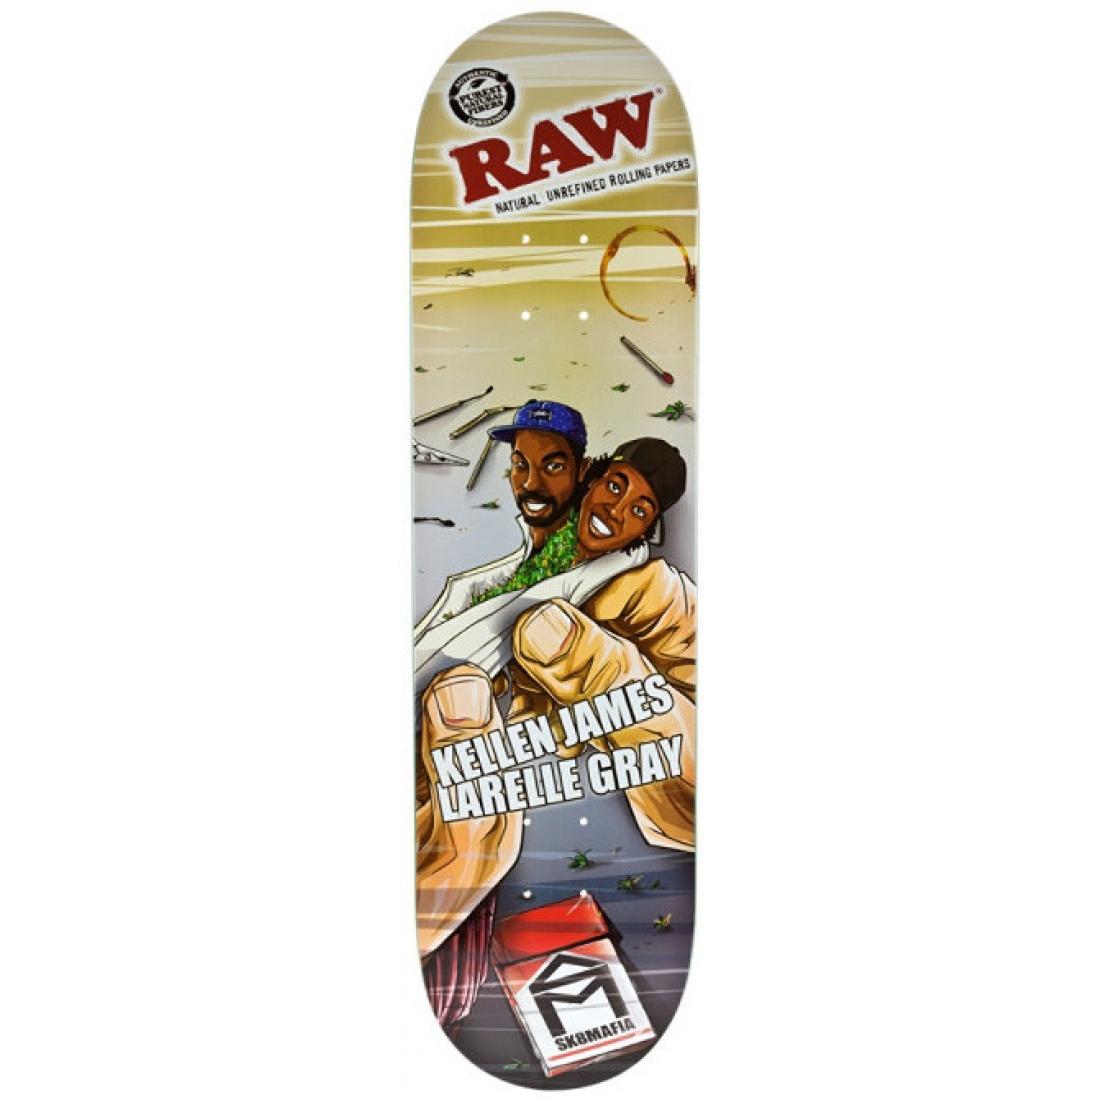 SM-Raw James/Gray 8.25 Deck